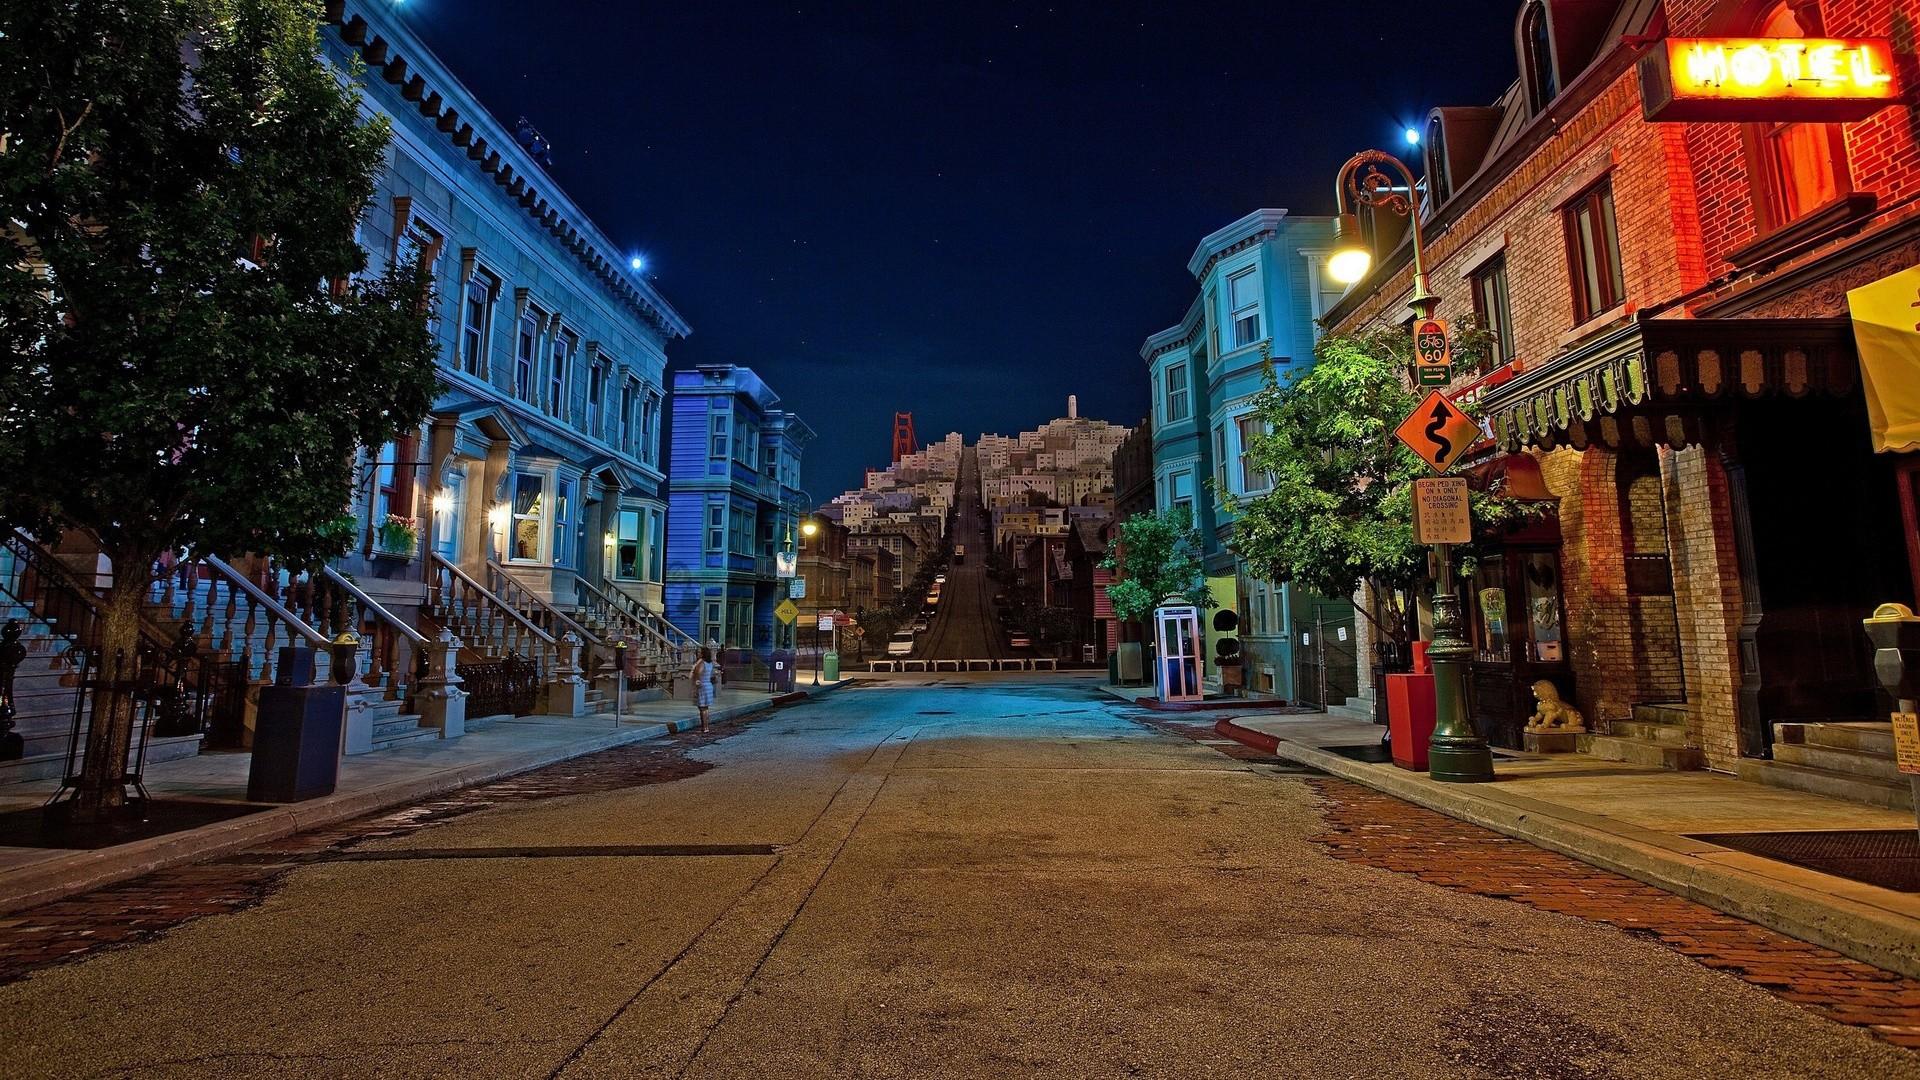 City Street at Night | STREETS NIGHT | Pinterest | Night city, 3d wallpaper  and Wallpaper